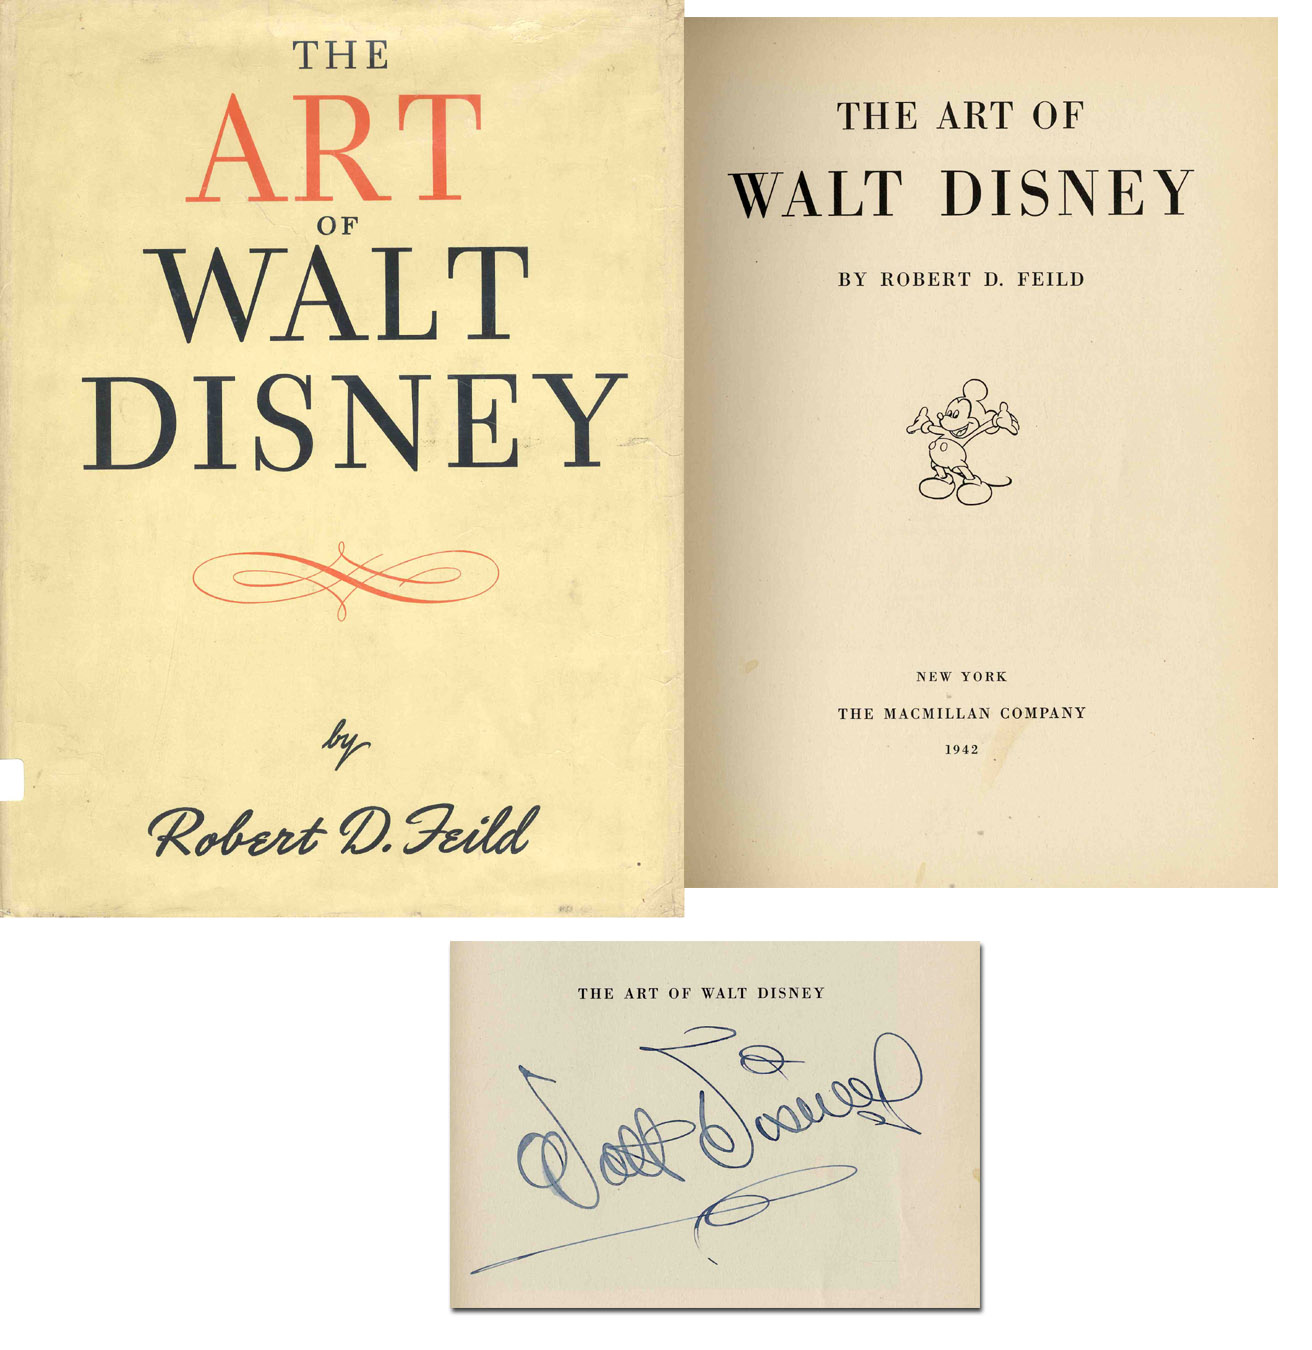 Walt Disney Autograph Art of Walt Disney 1st Ed Signed